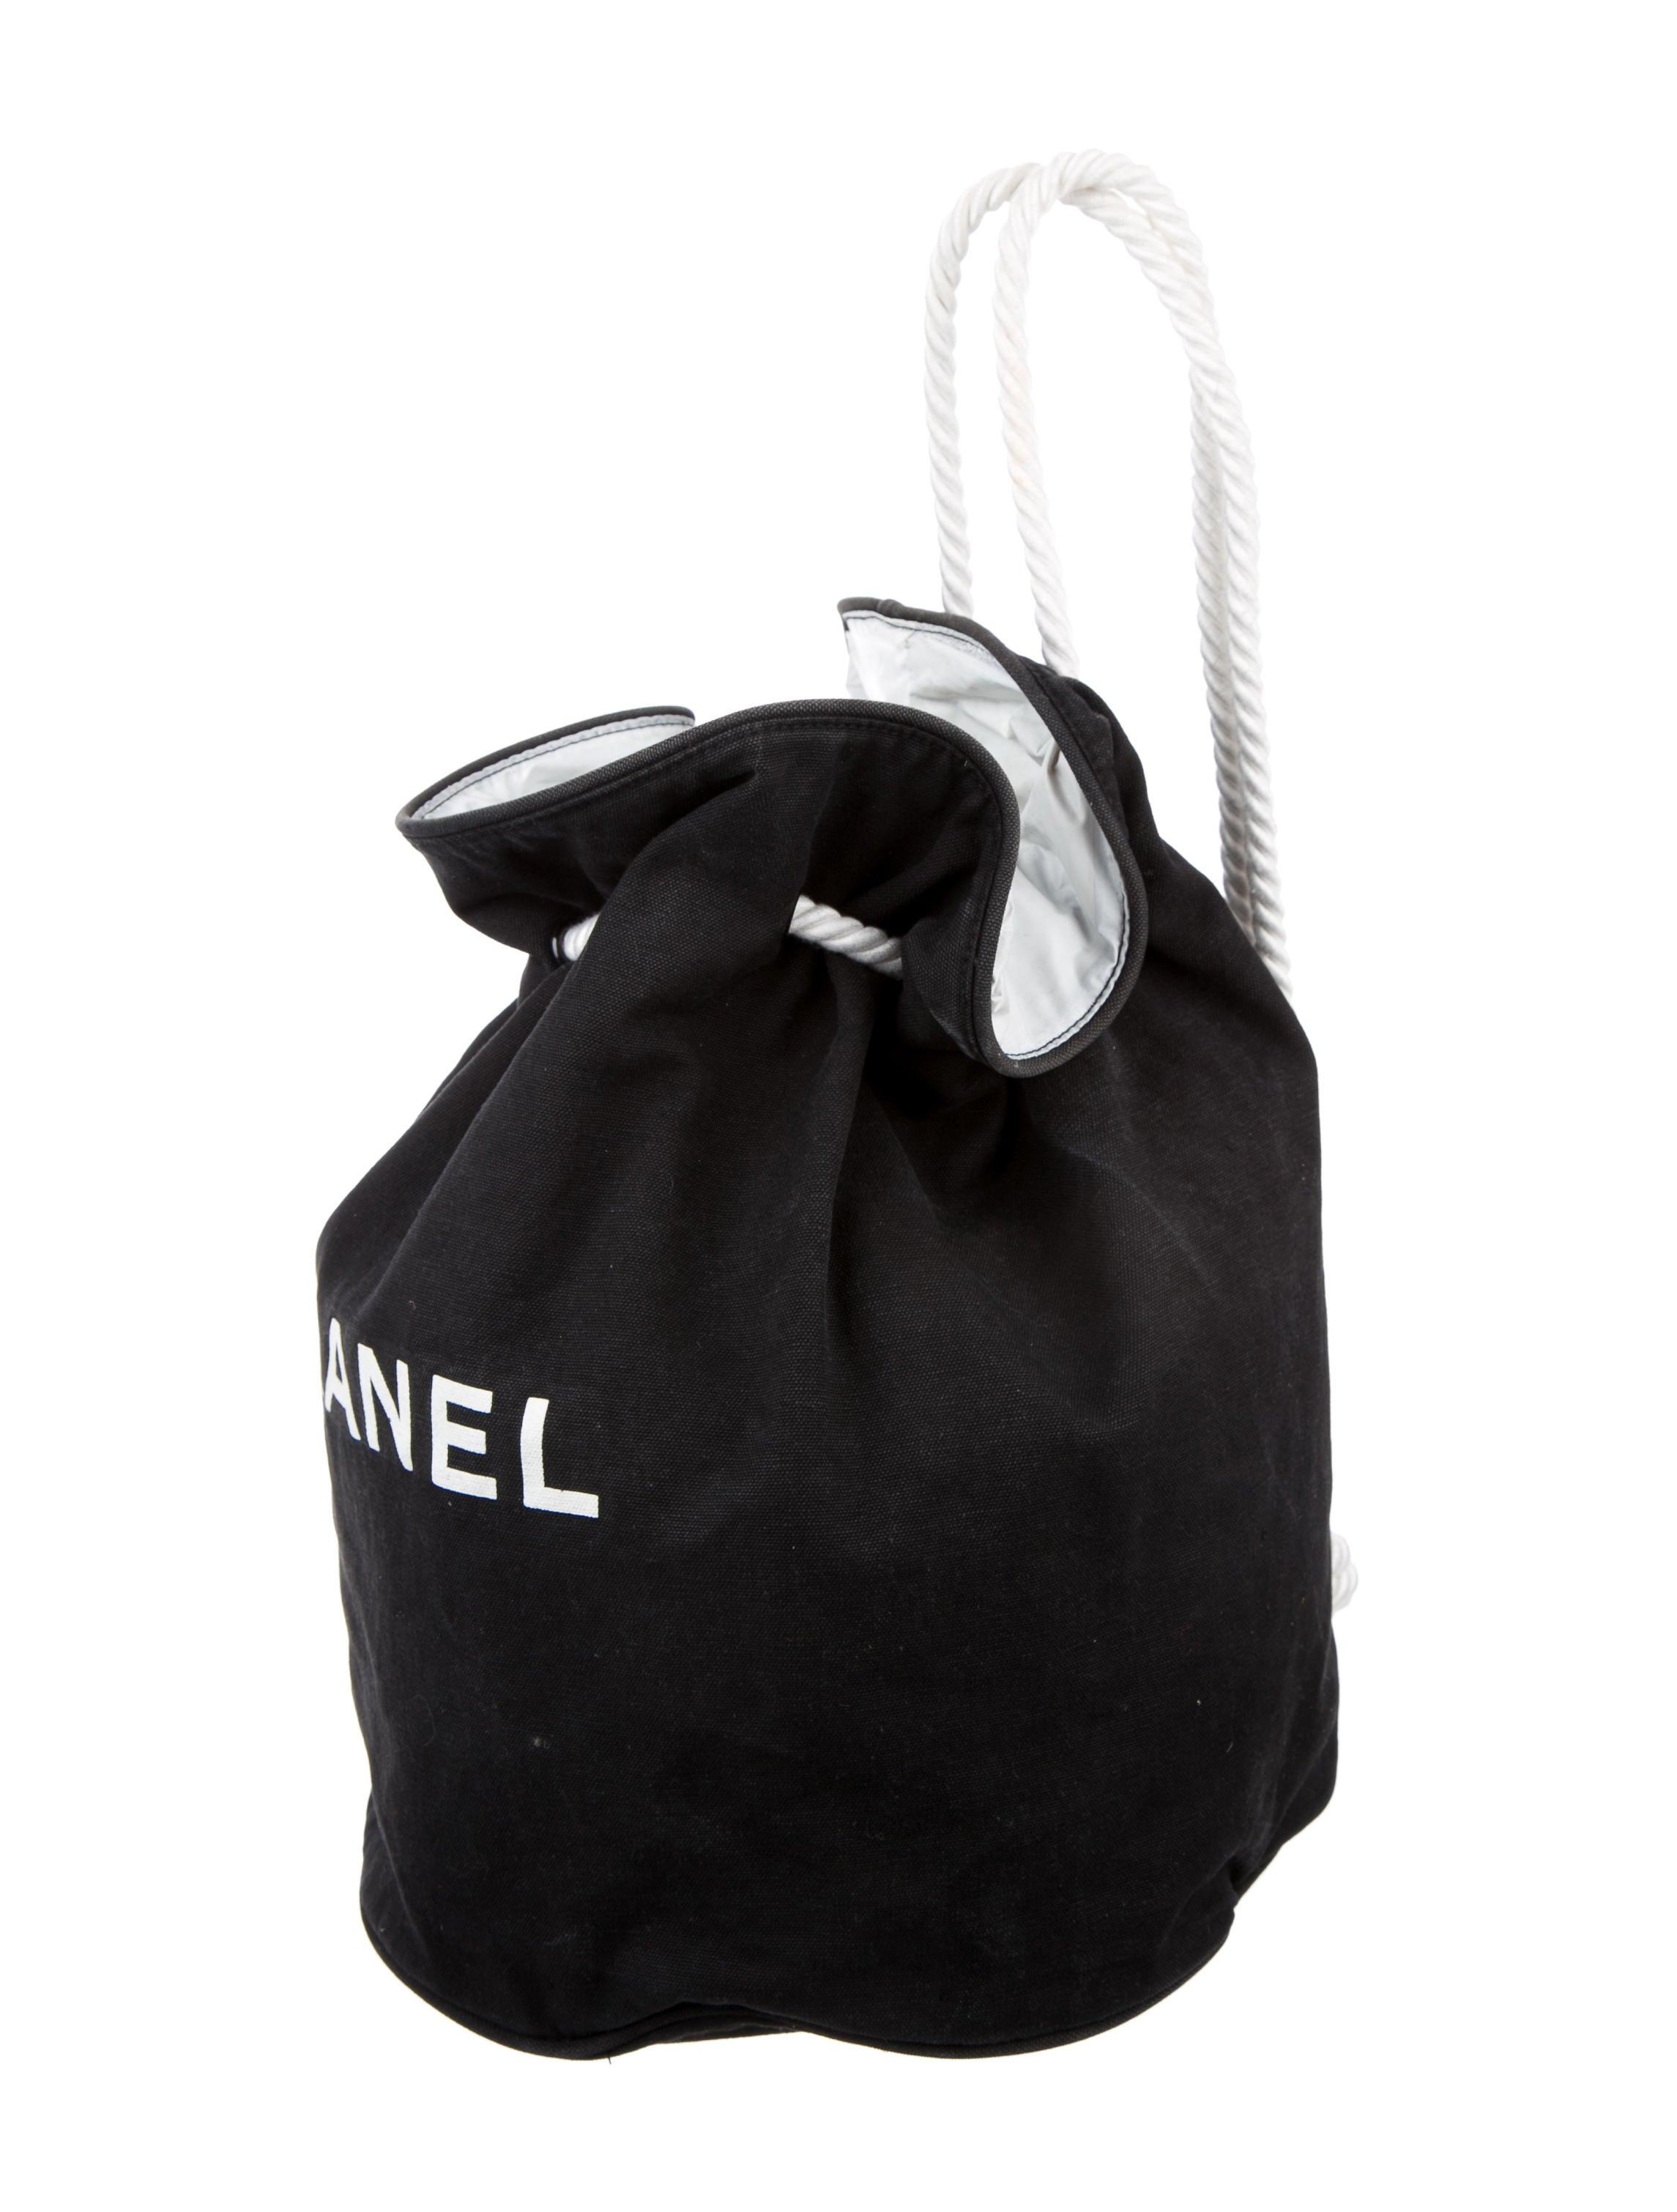 Chanel Canvas Drawstring Backpack - Handbags - CHA152465 | The ...